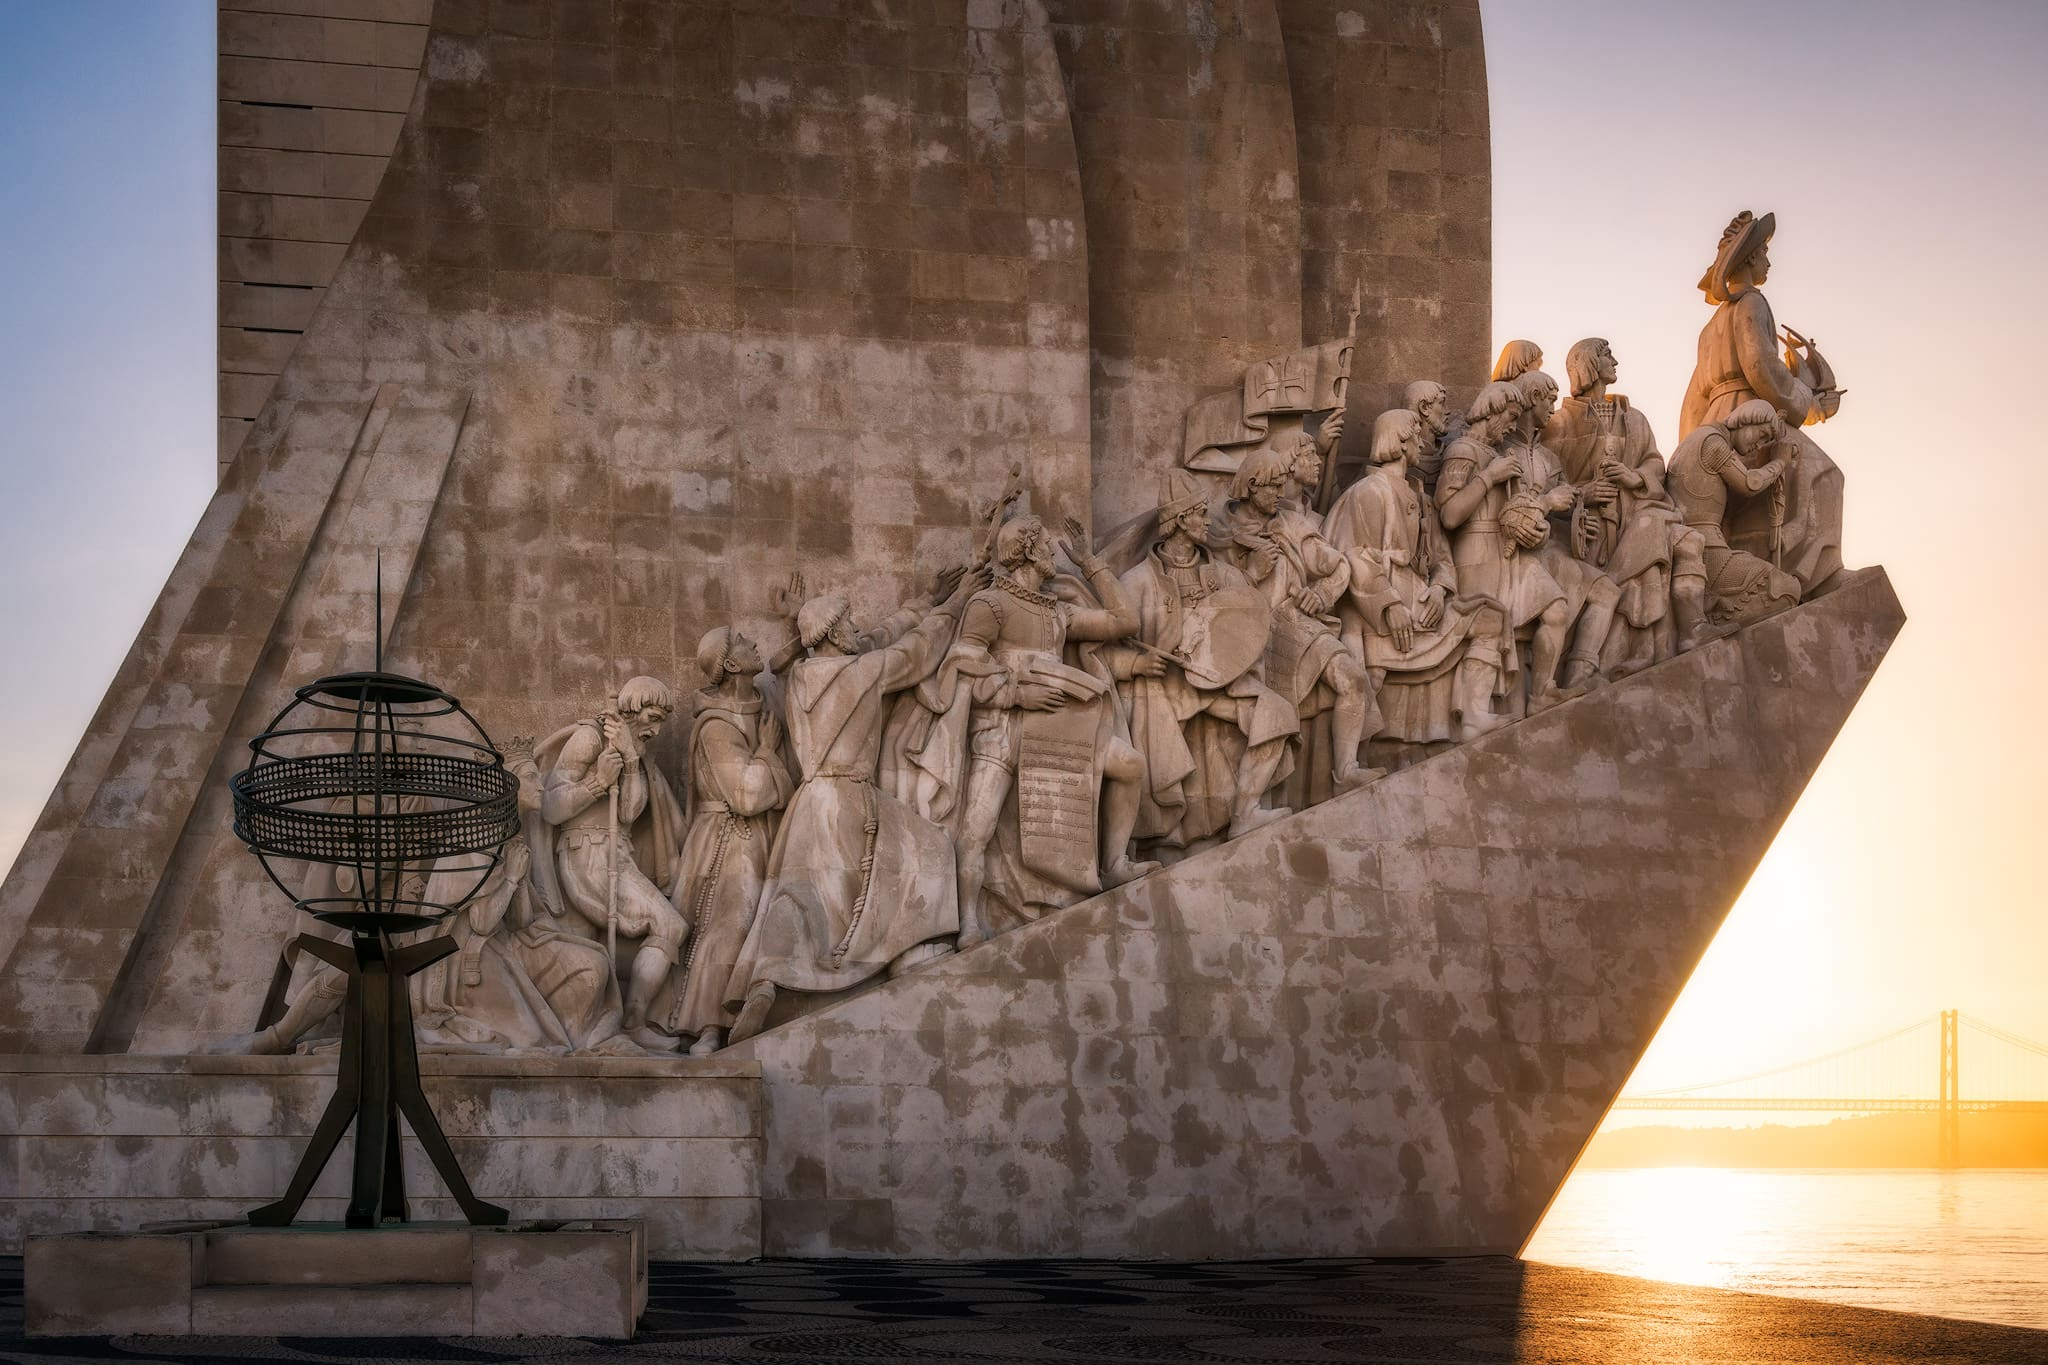 Das Denkmal der Entdeckungen (Padrão dos Descobrimentos) in Lissabon; Portugal